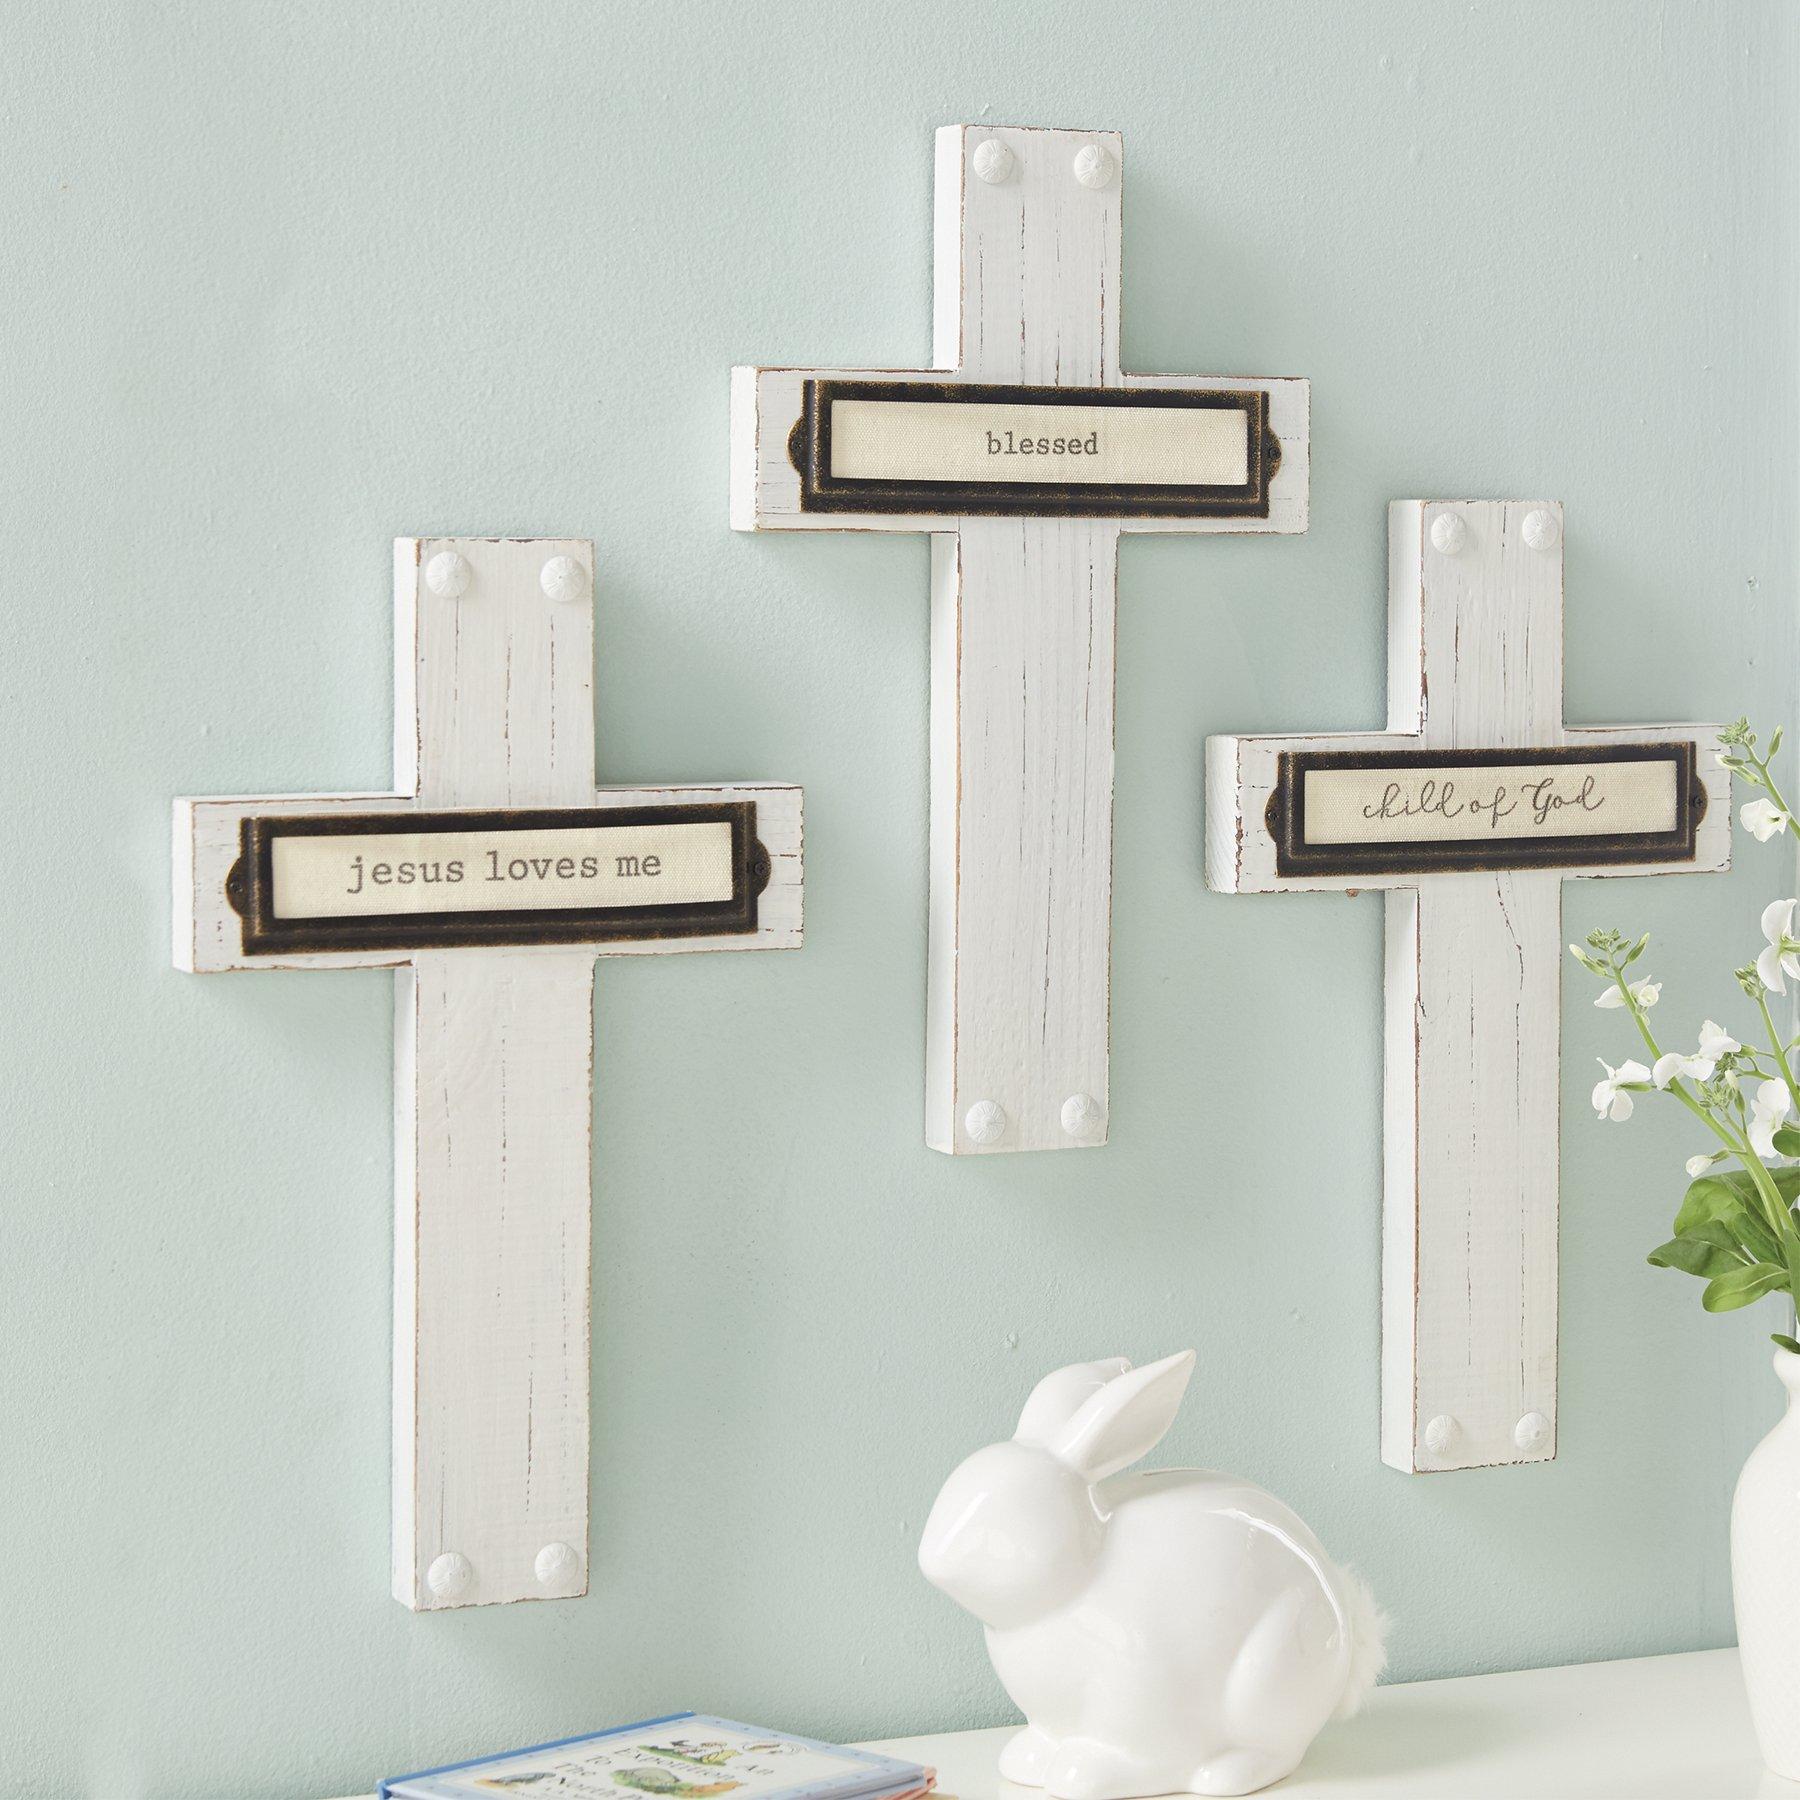 Mud Pie Bookplate Detailing Blessed Pine Wood Cross Wall Art, White